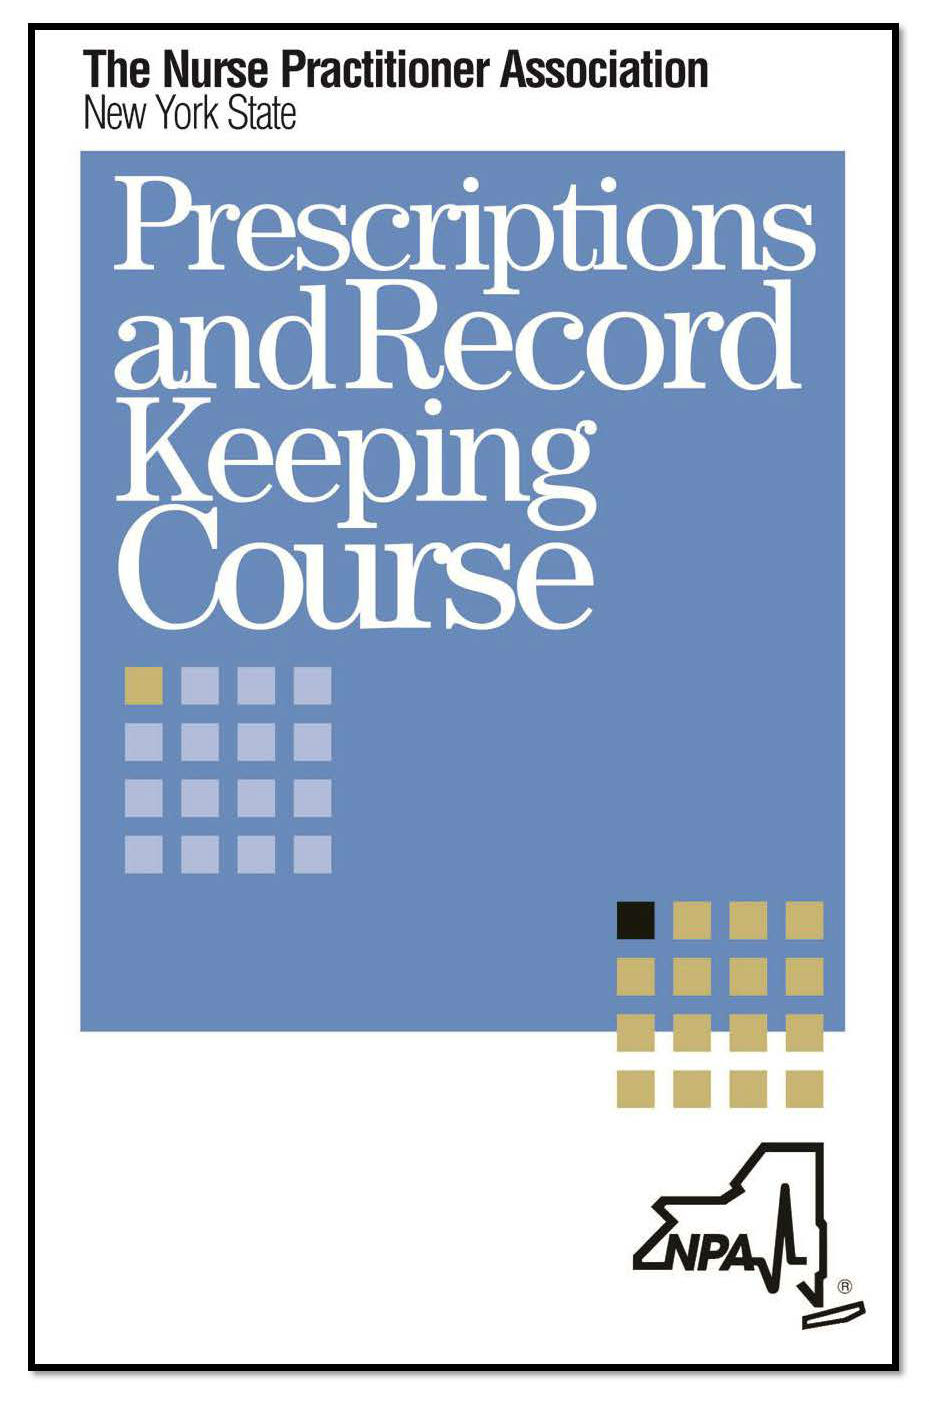 Prescriptions & Record Keeping Course - The NPA